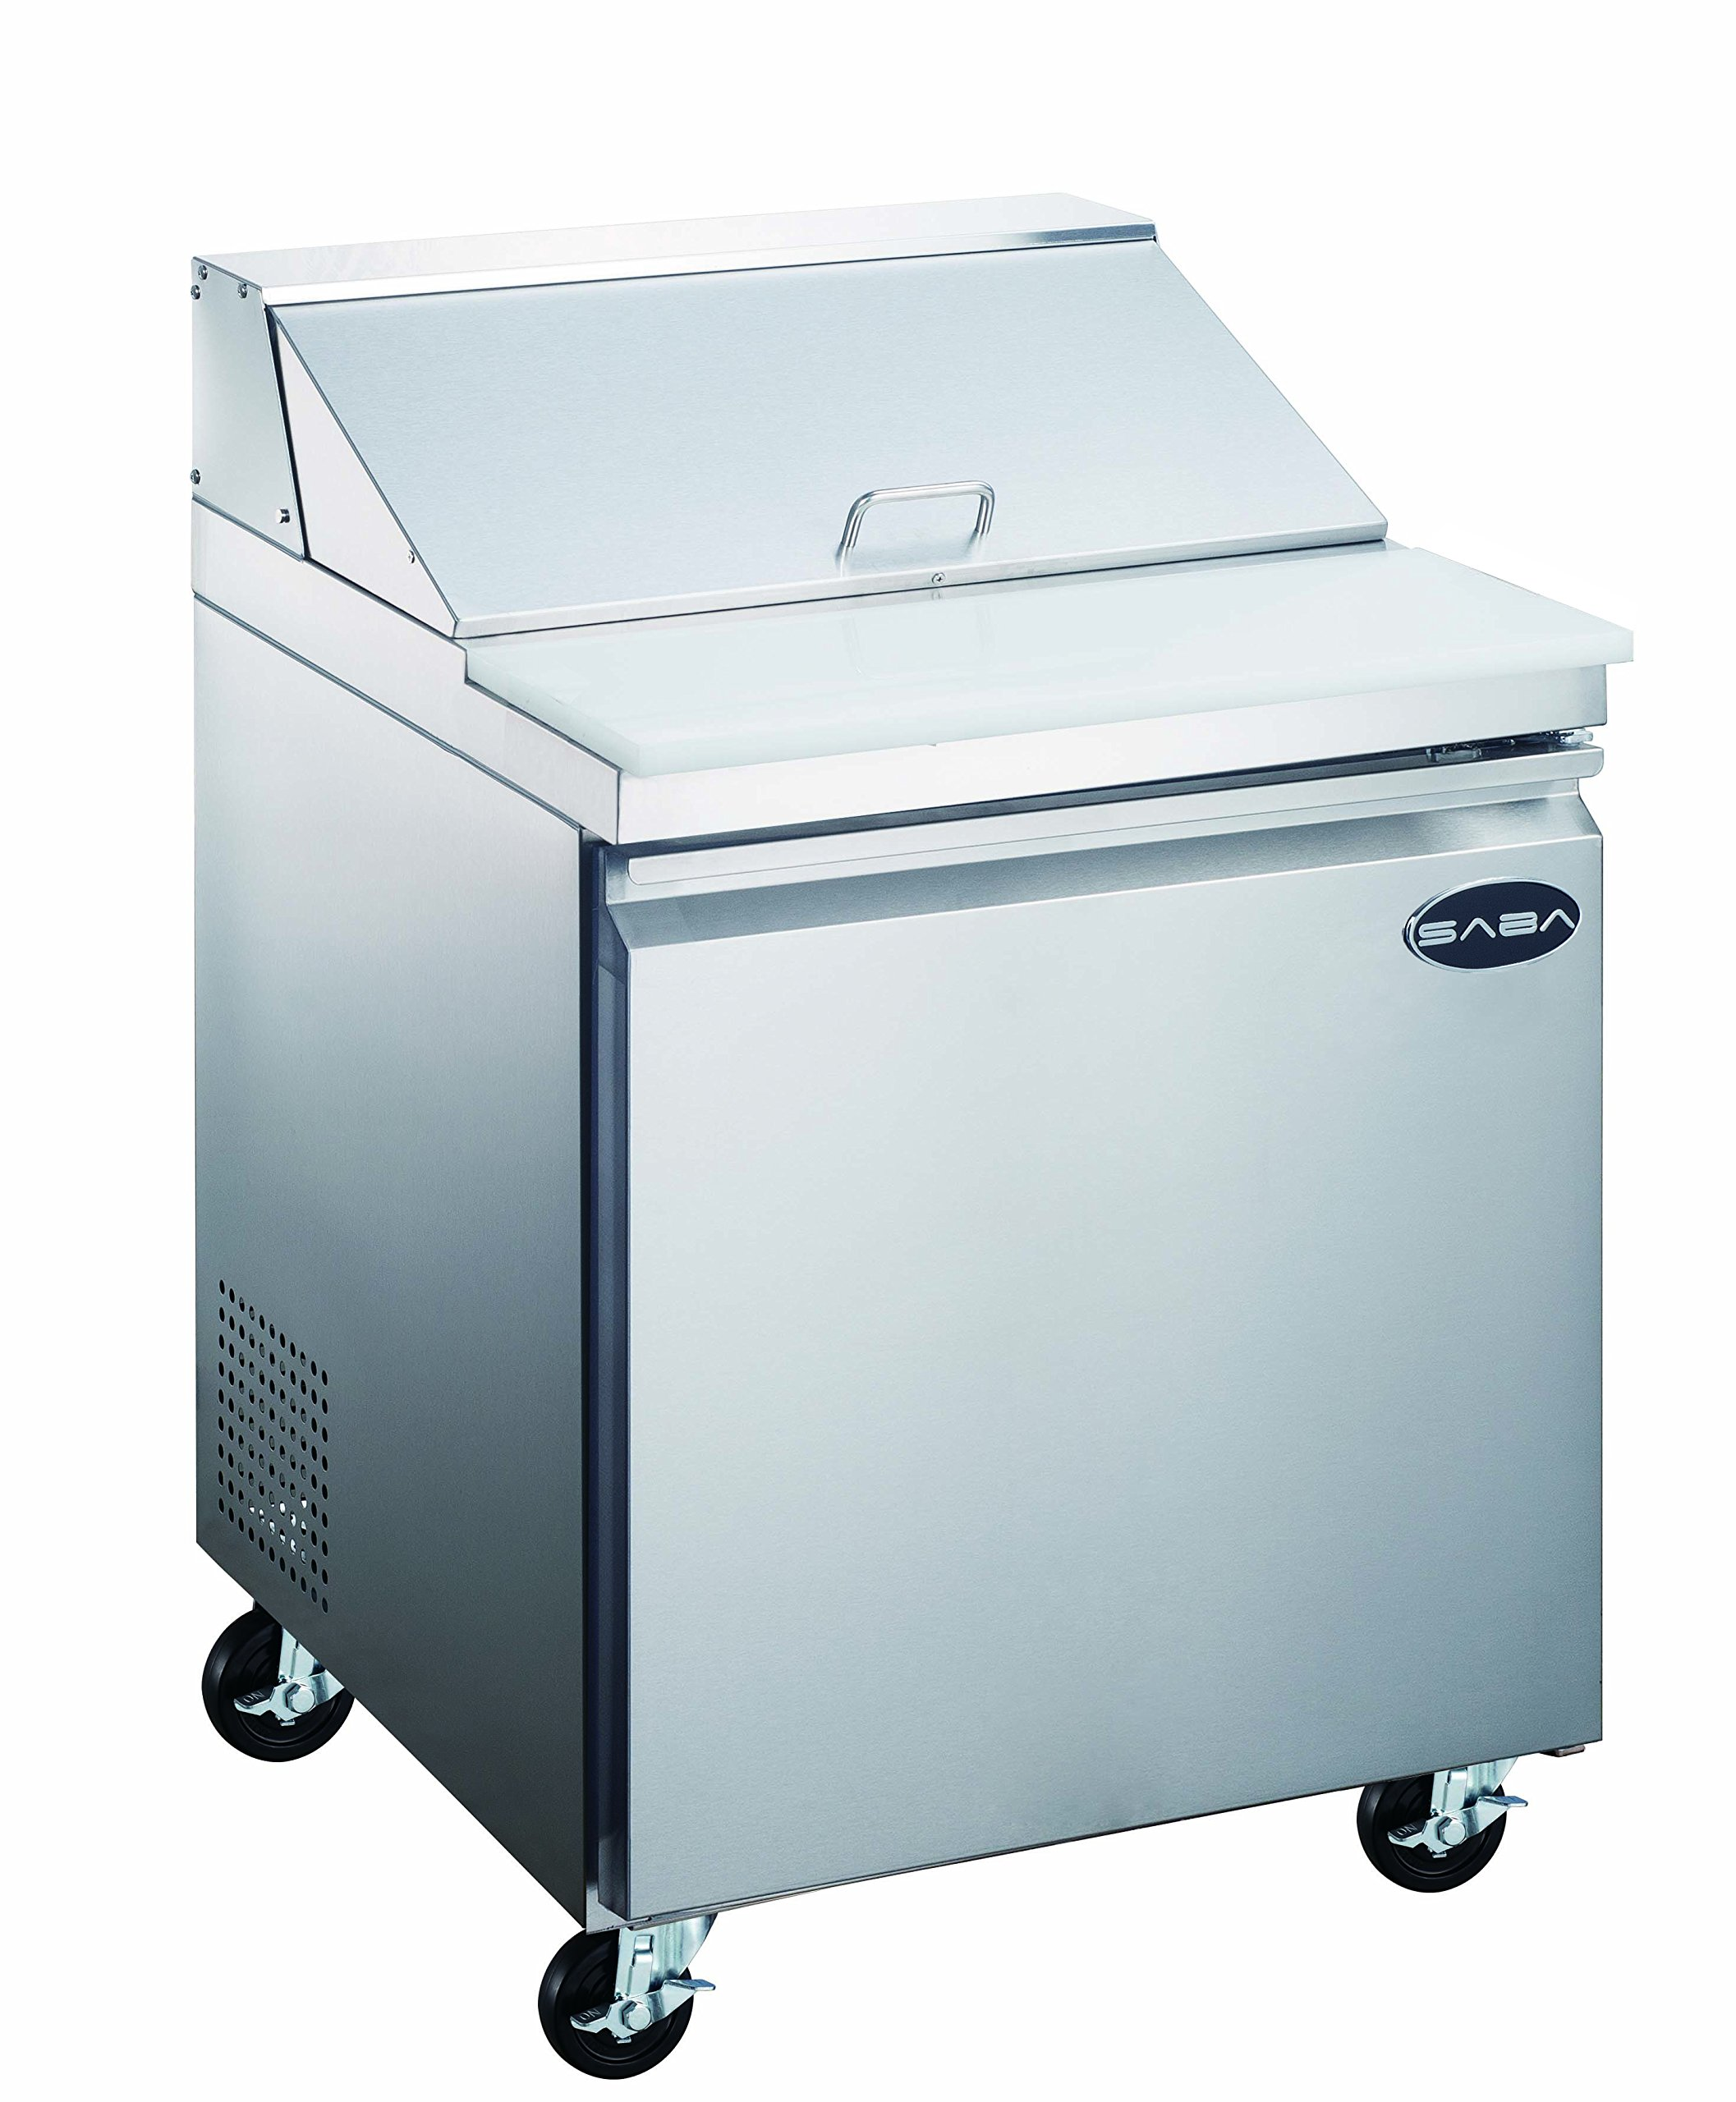 "SABA 27"" Commercial Sandwich Salad Prep Table Refrigerator Cooler"